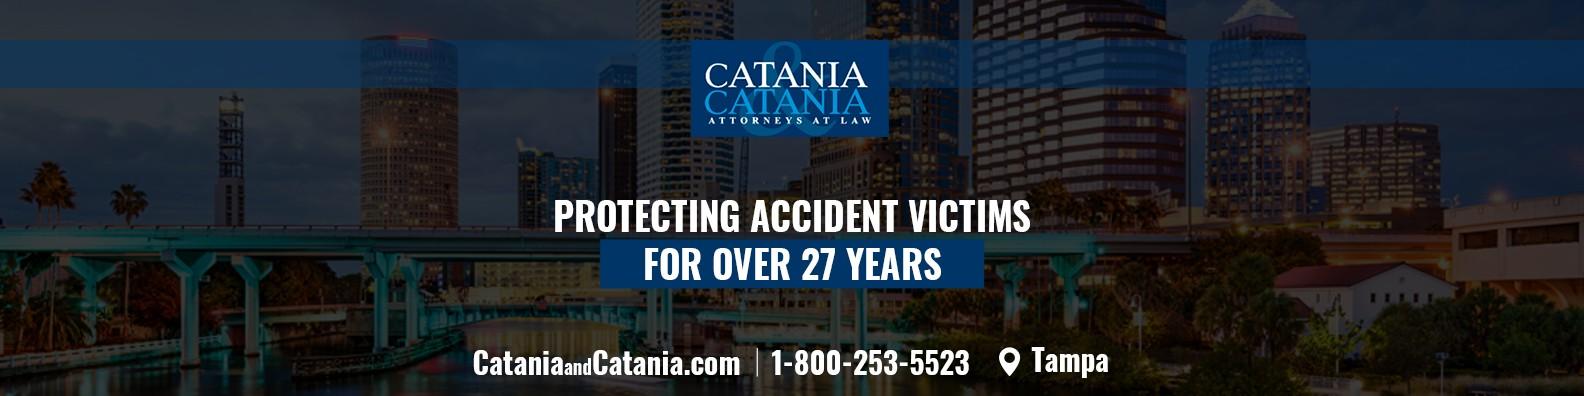 Catania & Catania P A  | LinkedIn